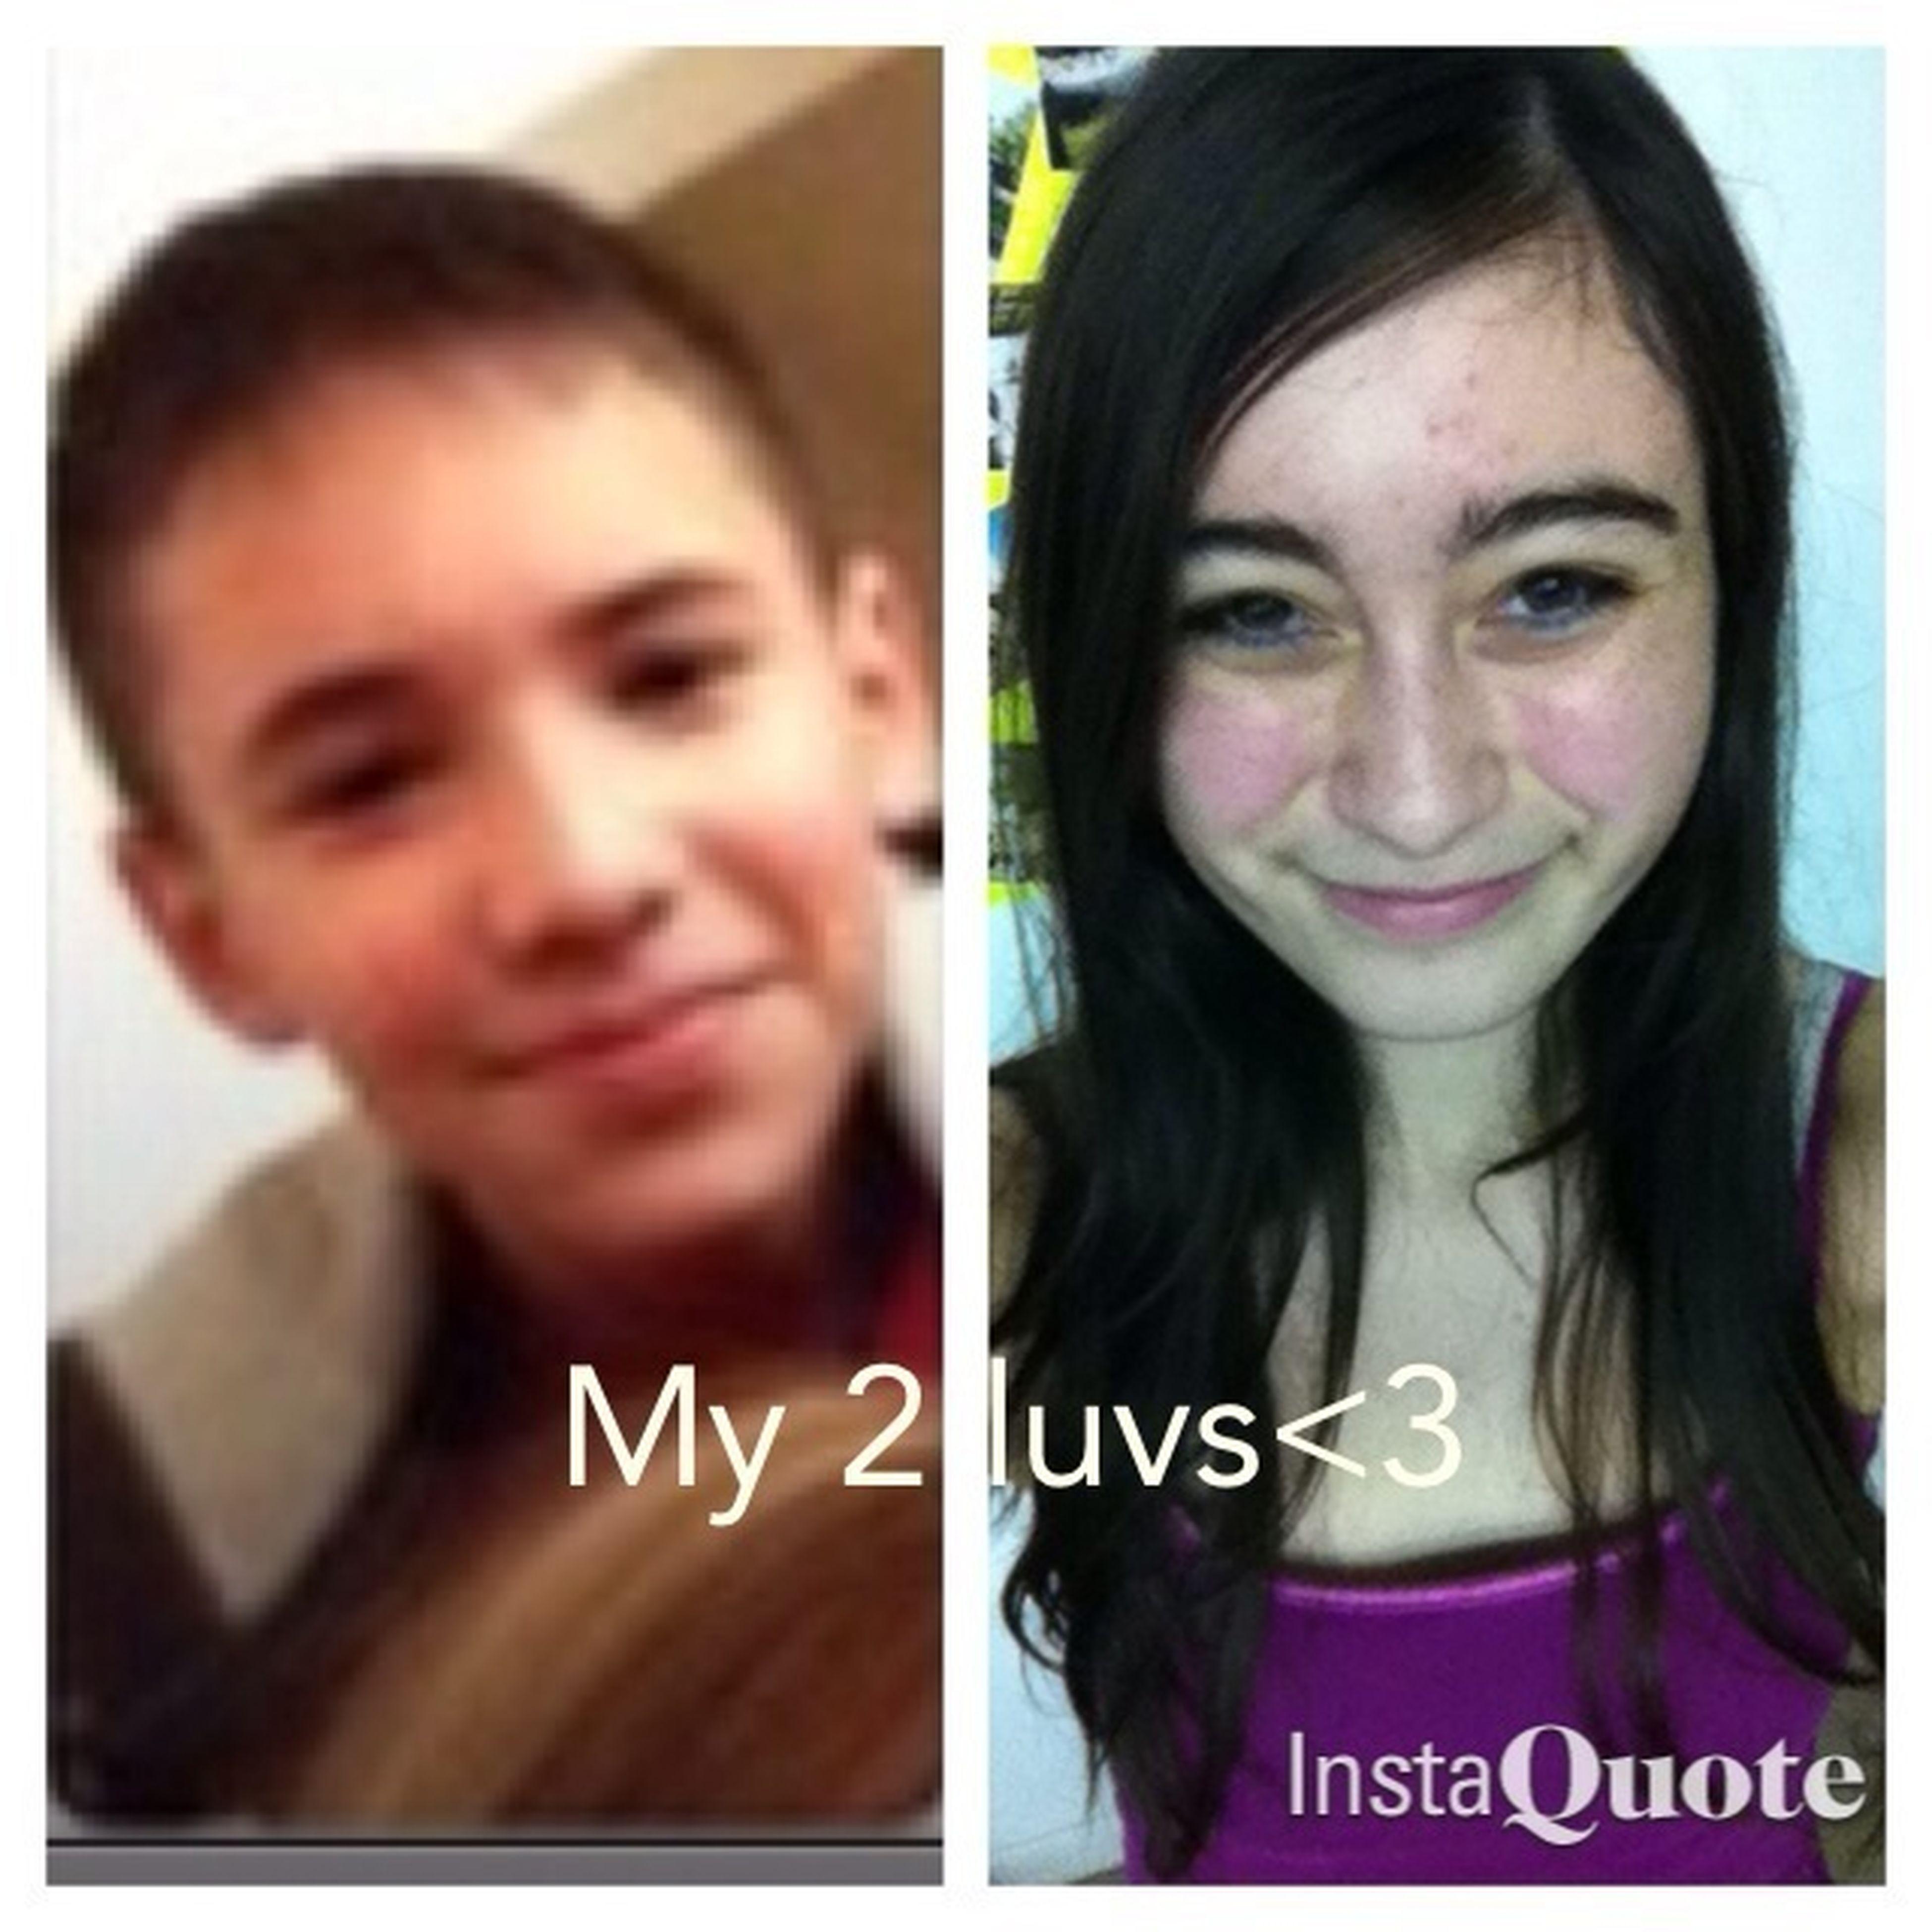 My 2 Luvs Boyfriend And My Best Friend